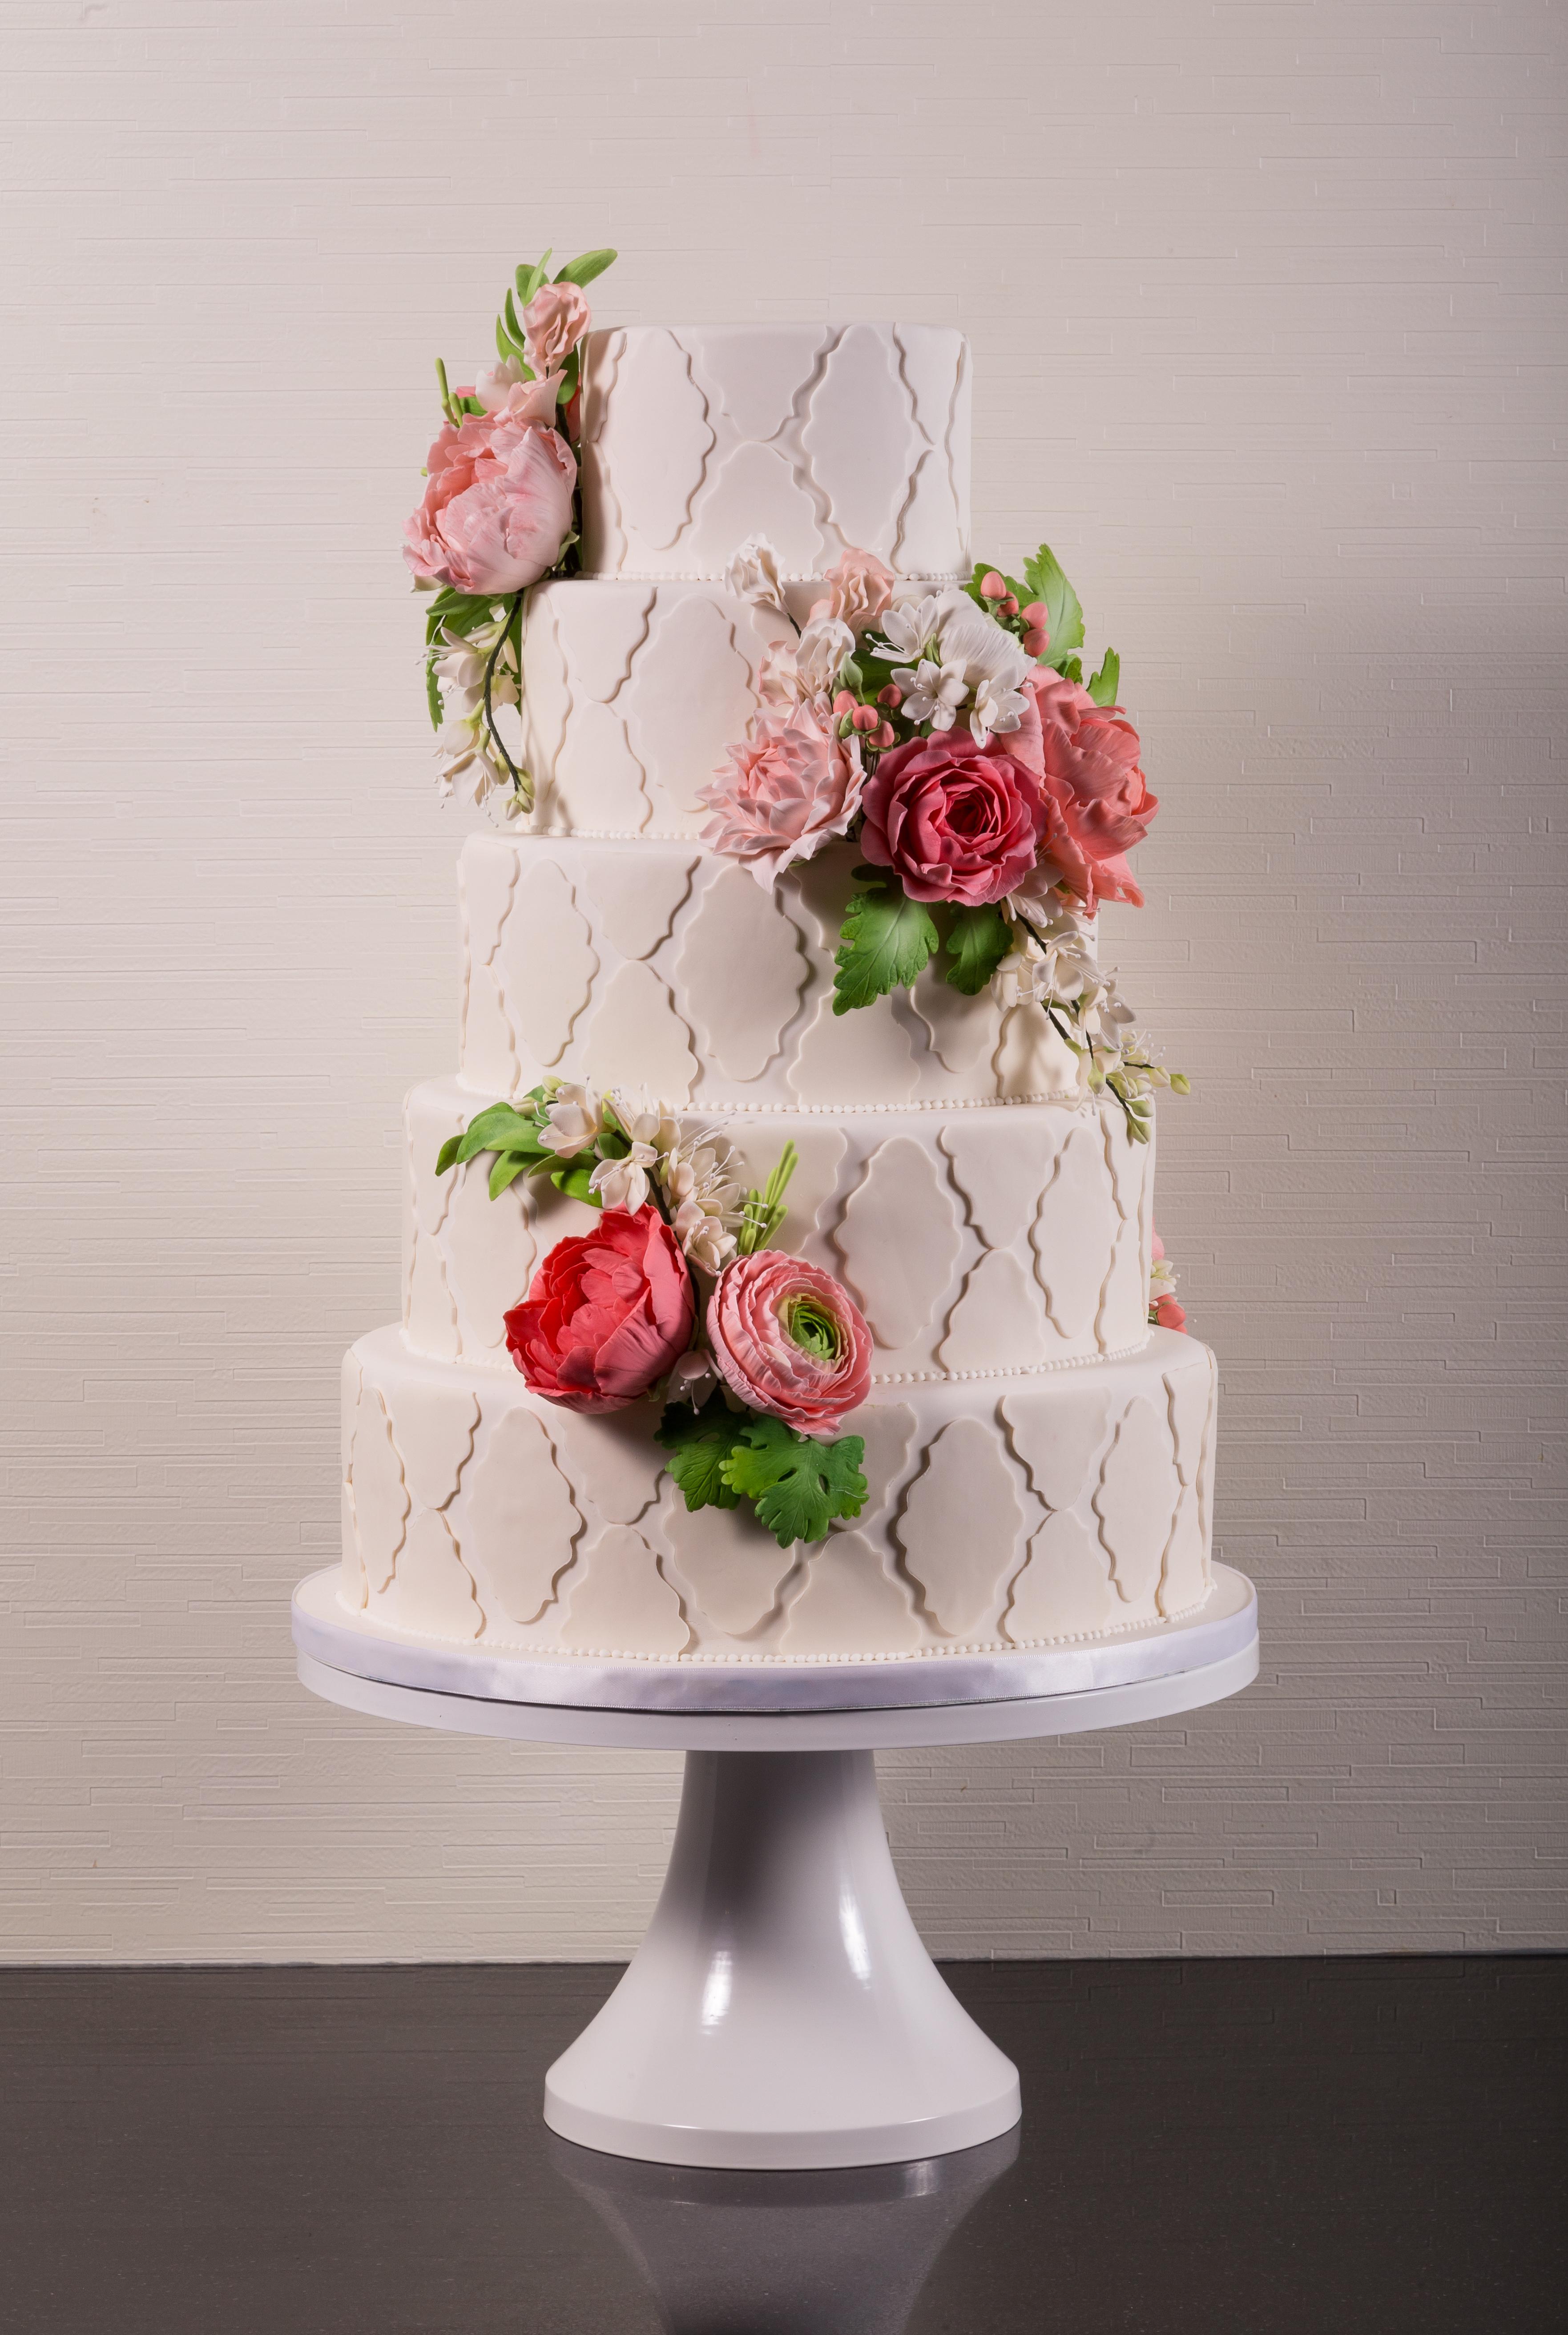 Jennifer smith satin ice baby pink wedding cake with pink sugar roses mightylinksfo